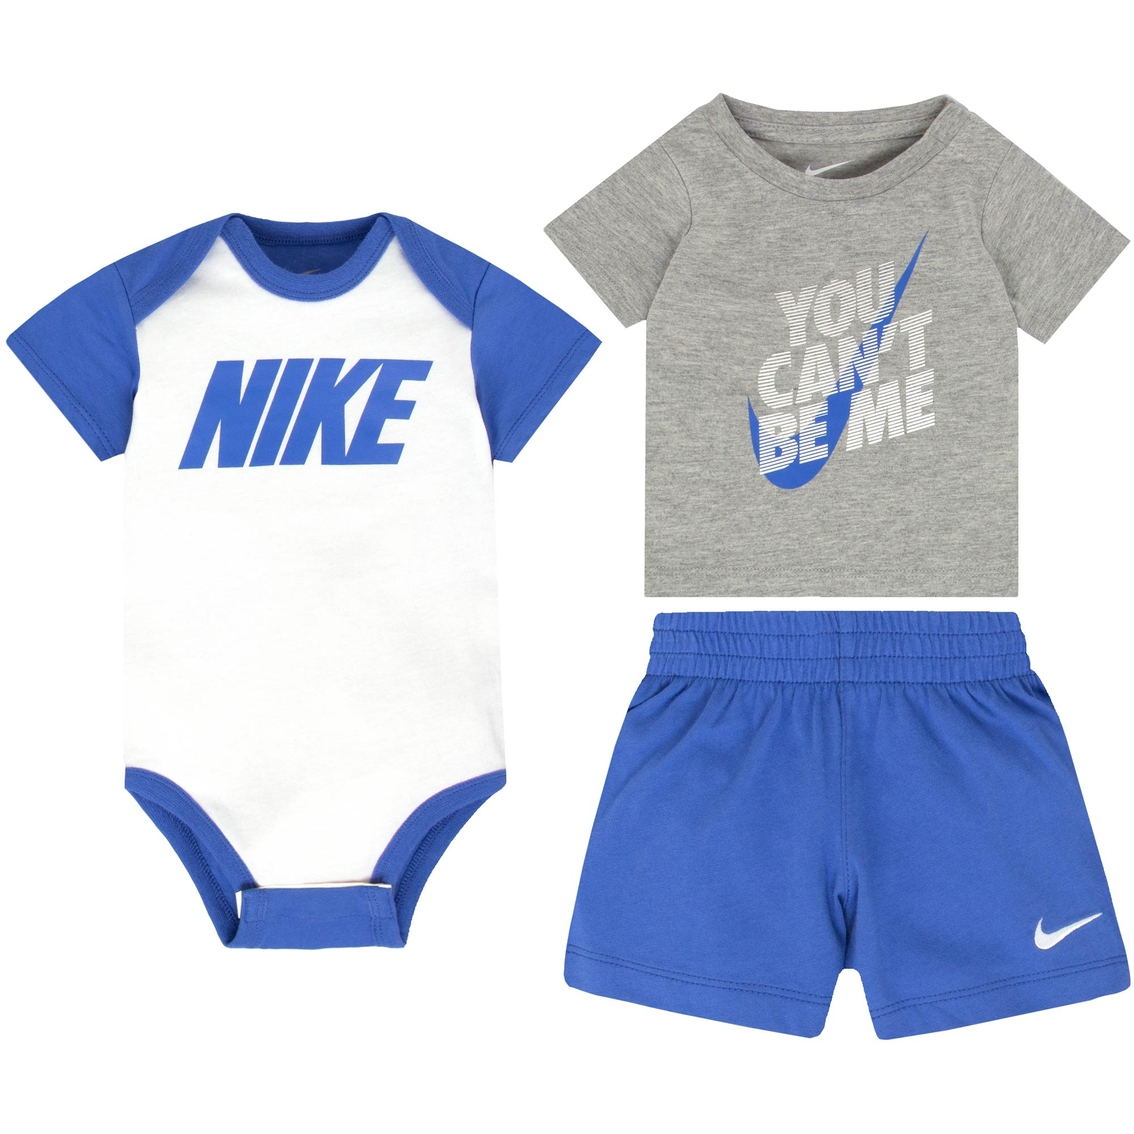 23b103d2b002 Nike Infant Boys Creeper, Tee And Shorts 3 Pc. Set   Baby Boy 0-24 ...